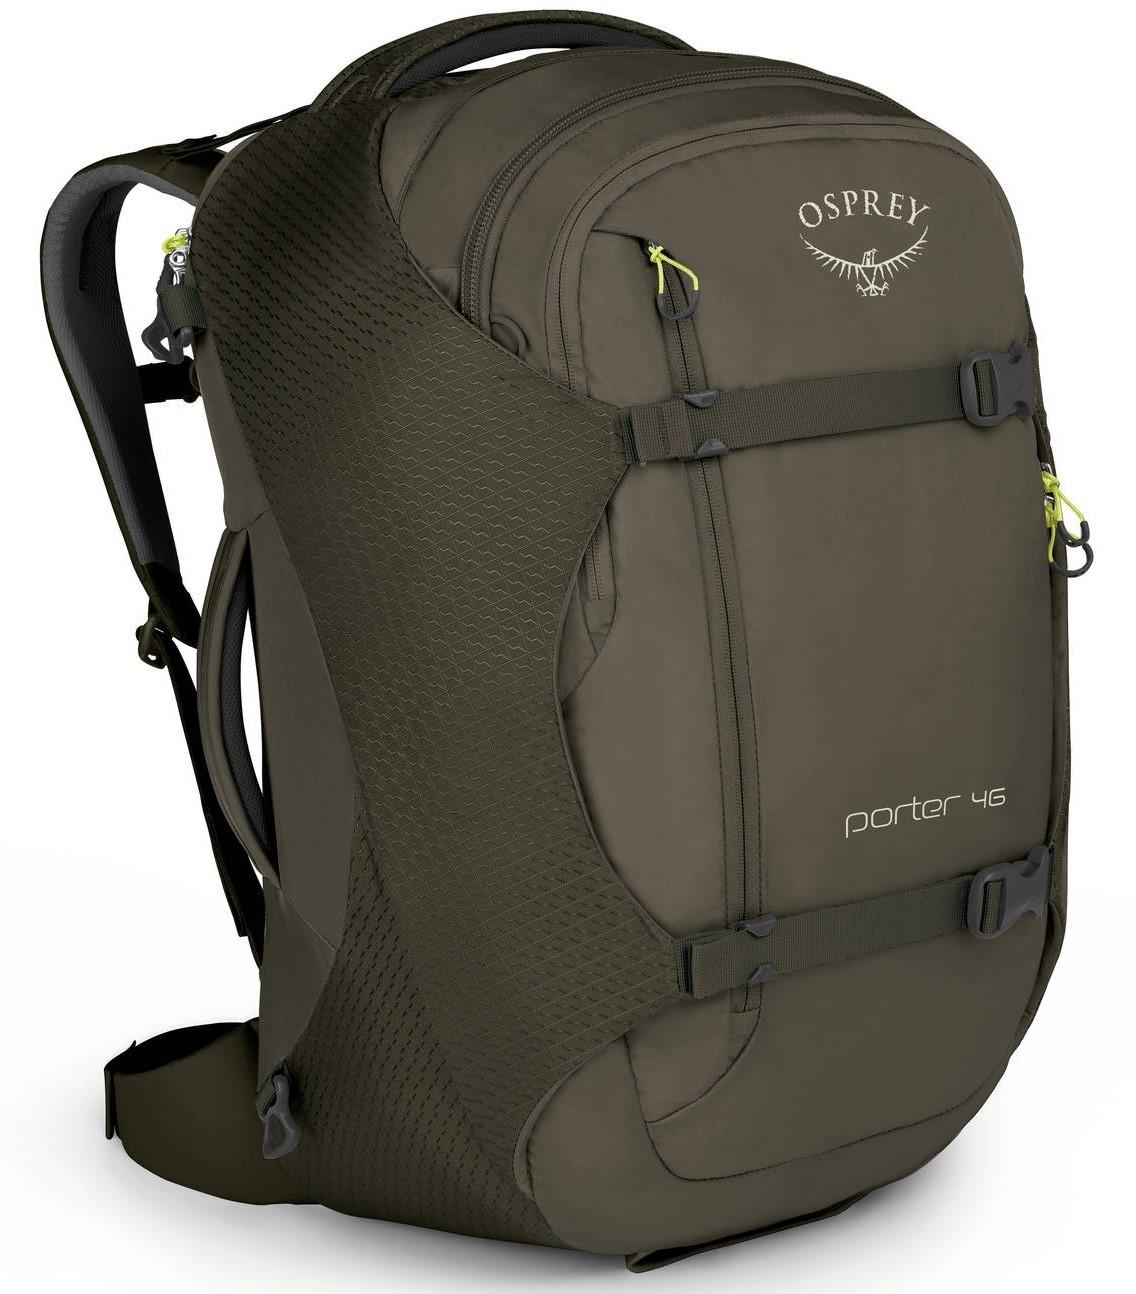 Сумки-рюкзаки Сумка-рюкзак Osprey Porter 46 Castle Grey Porter_46_F17_Side_Castle_Grey_web.jpg